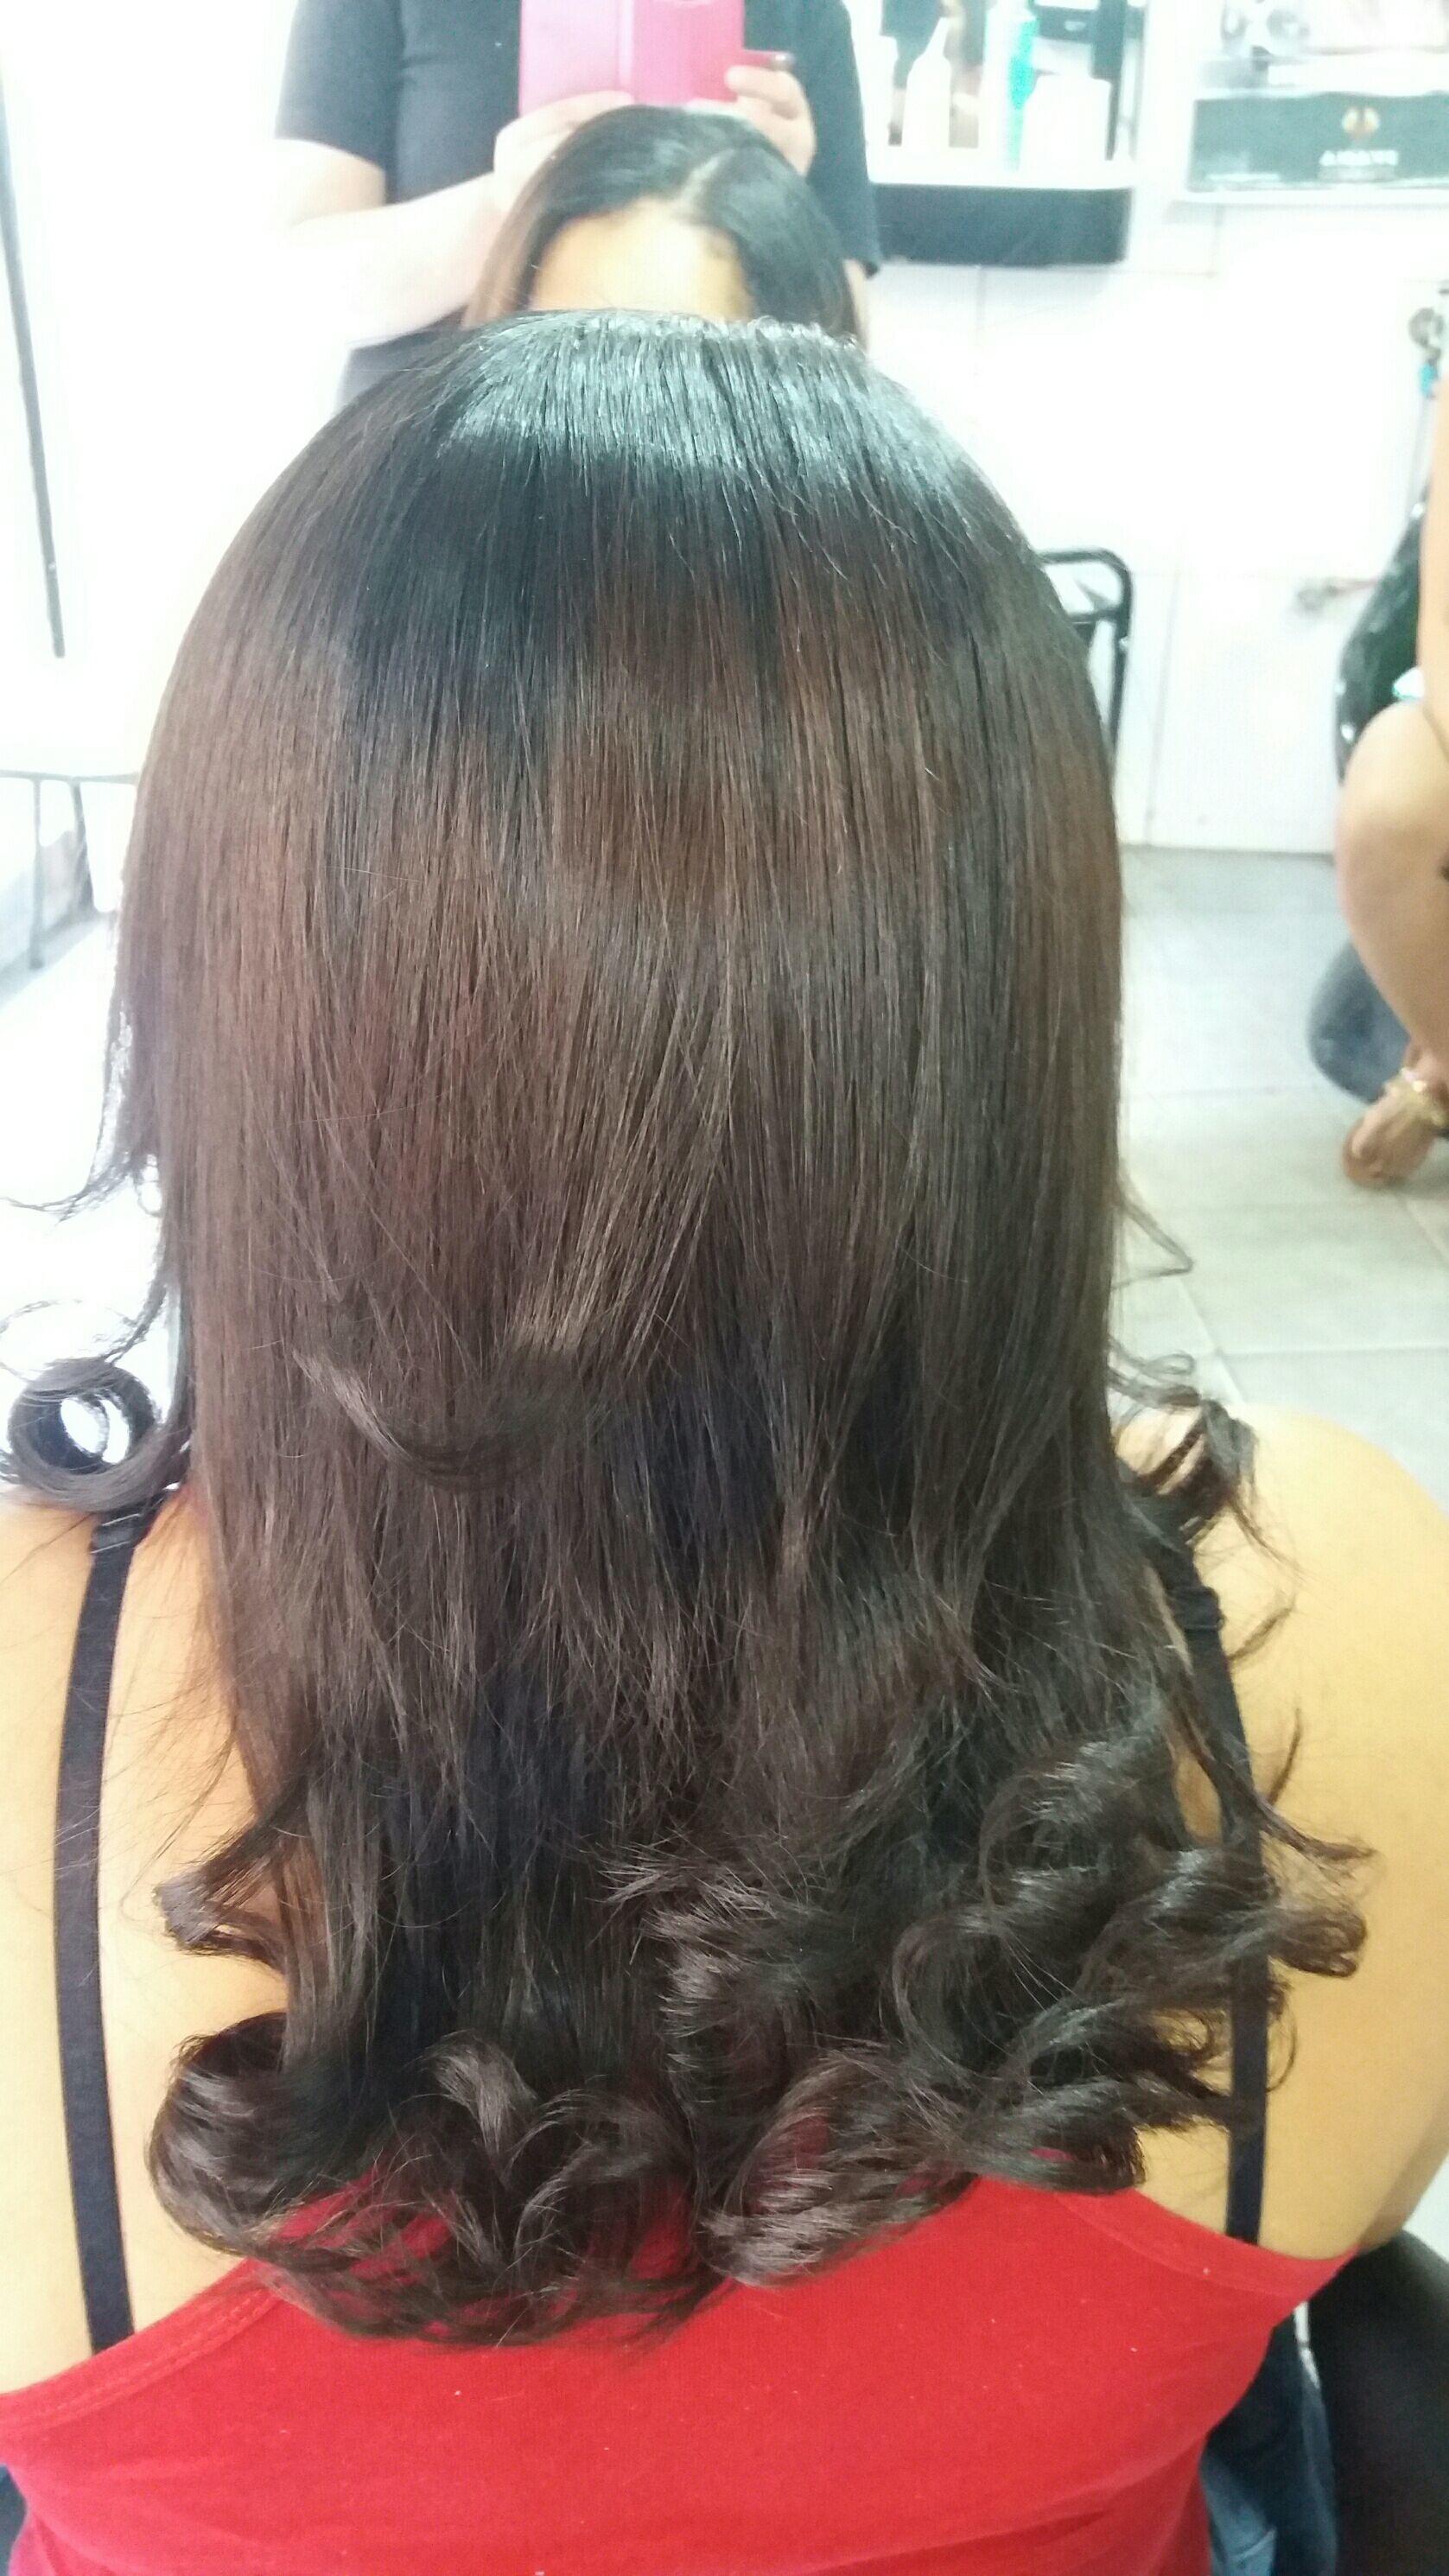 cabelo cabeleireiro(a) cabeleireiro(a) cabeleireiro(a) cabeleireiro(a) cabeleireiro(a) cabeleireiro(a) cabeleireiro(a) cabeleireiro(a) cabeleireiro(a) cabeleireiro(a) cabeleireiro(a) cabeleireiro(a) cabeleireiro(a) cabeleireiro(a) cabeleireiro(a) cabeleireiro(a) cabeleireiro(a) cabeleireiro(a) assistente esteticista cabeleireiro(a) cabeleireiro(a) cabeleireiro(a) cabeleireiro(a) cabeleireiro(a) cabeleireiro(a) cabeleireiro(a) cabeleireiro(a) cabeleireiro(a) cabeleireiro(a) cabeleireiro(a) cabeleireiro(a) cabeleireiro(a) cabeleireiro(a) cabeleireiro(a) cabeleireiro(a) cabeleireiro(a) cabeleireiro(a) cabeleireiro(a) cabeleireiro(a) escovista cabeleireiro(a) cabeleireiro(a) escovista cabeleireiro(a) cabeleireiro(a) auxiliar cabeleireiro(a) auxiliar cabeleireiro(a) cabeleireiro(a)